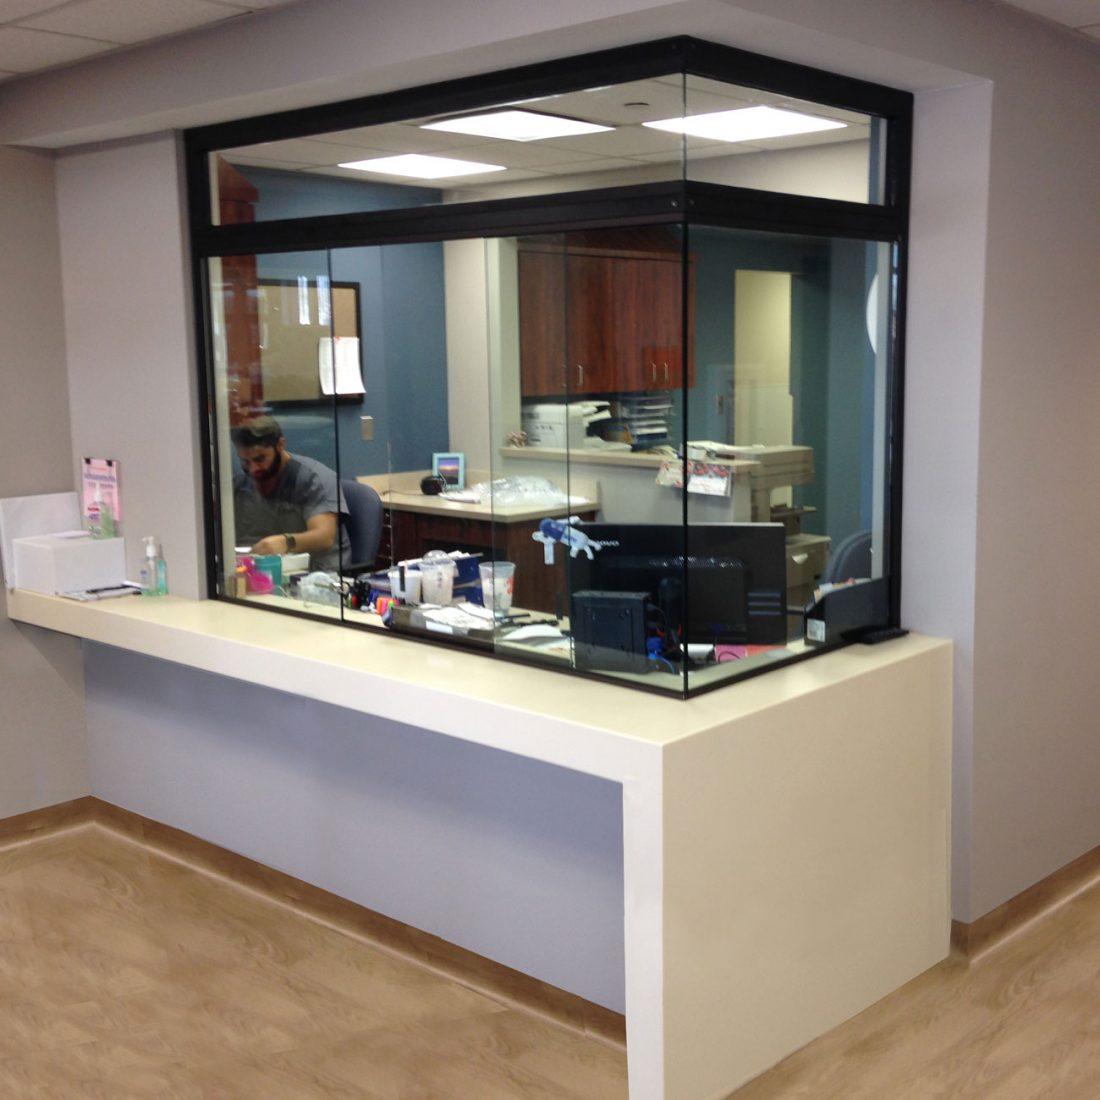 Southgate Dialysis Center